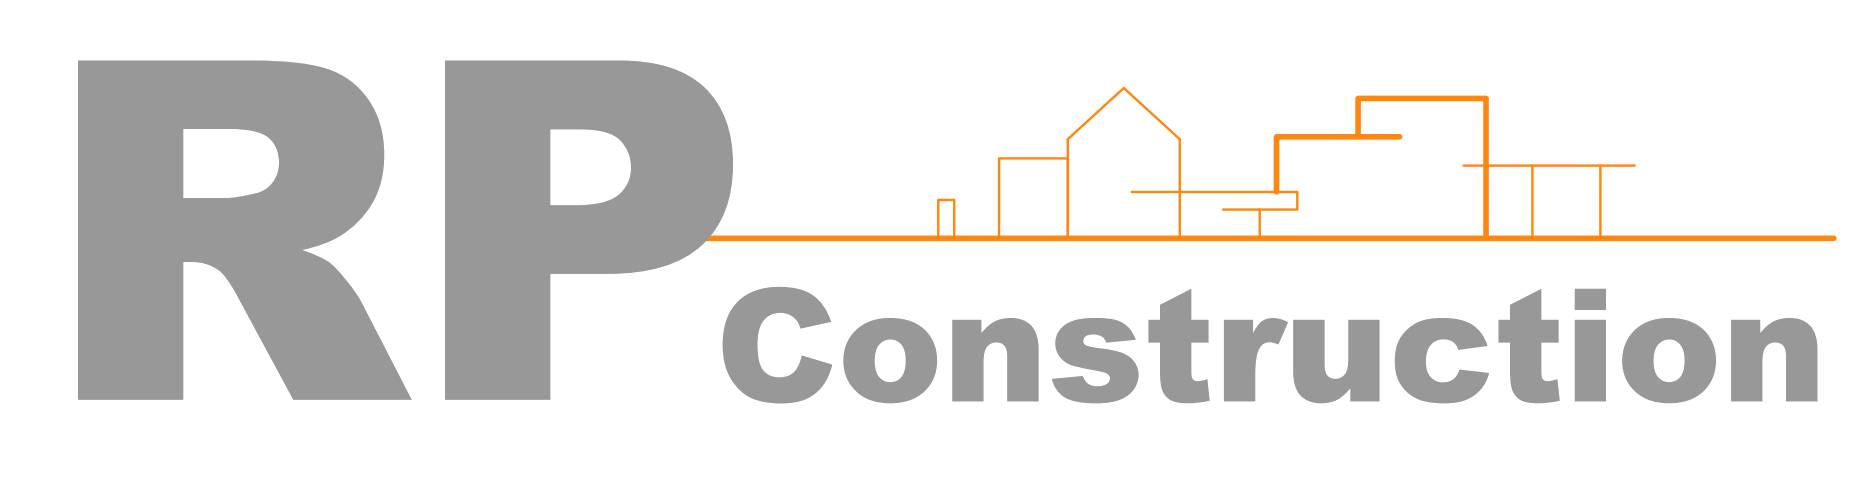 RPconstruction